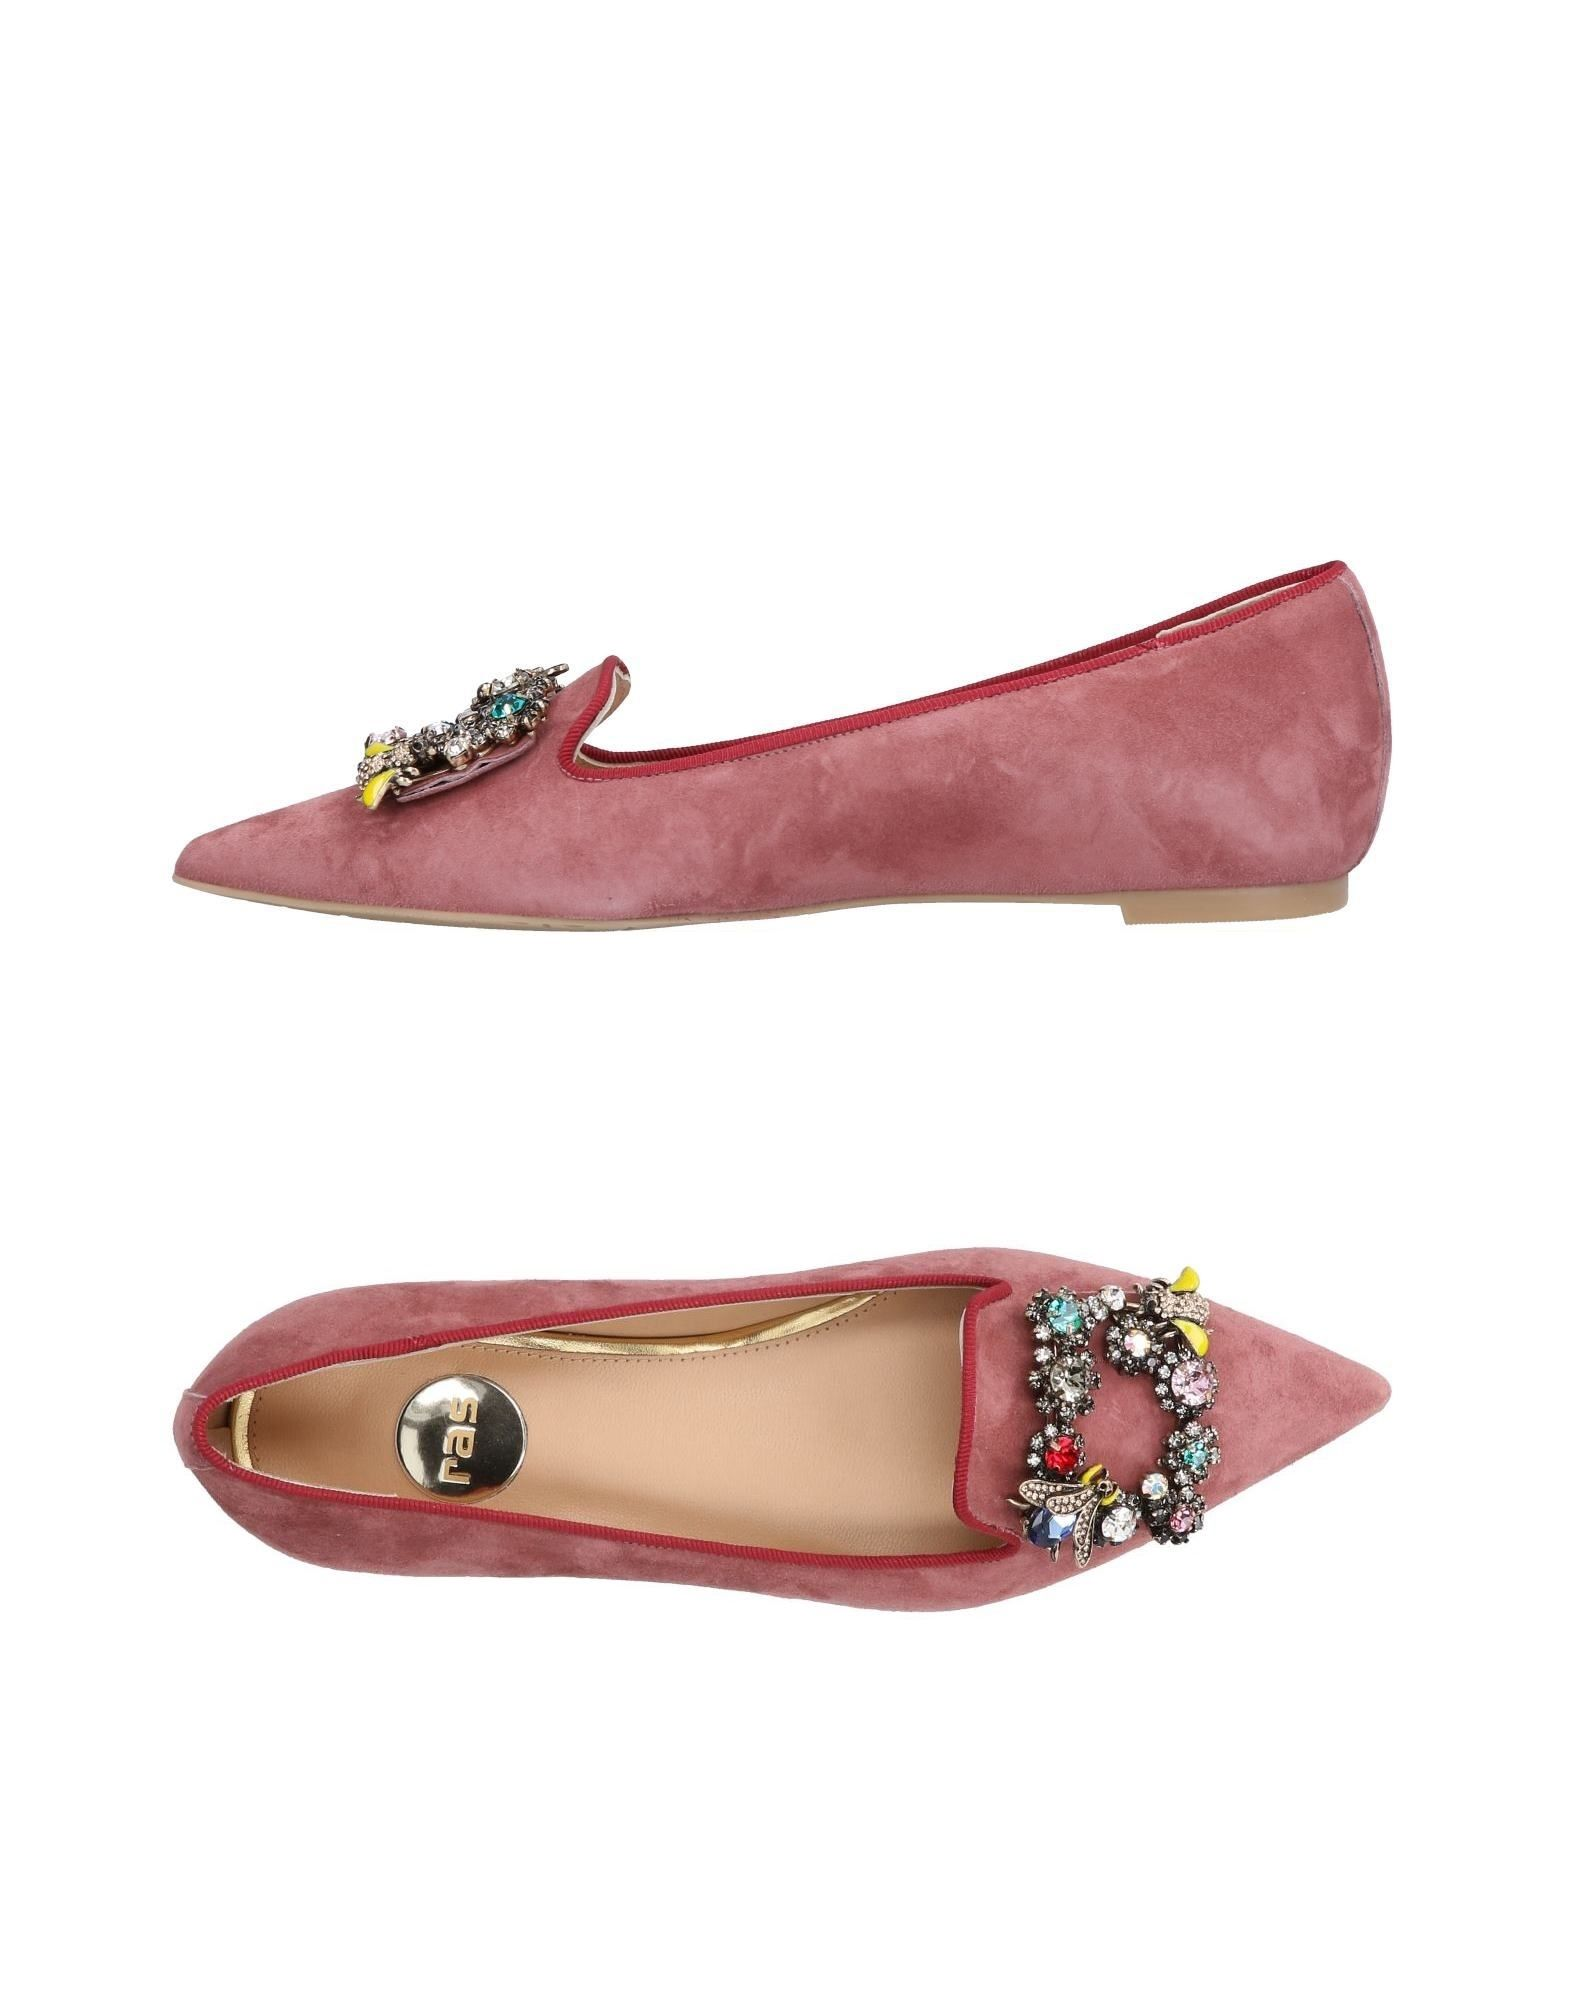 7babb253ef65cb Stilvolle billige Schuhe Schuhe Schuhe Ras Mokassins Damen 11438357HF 55f38b